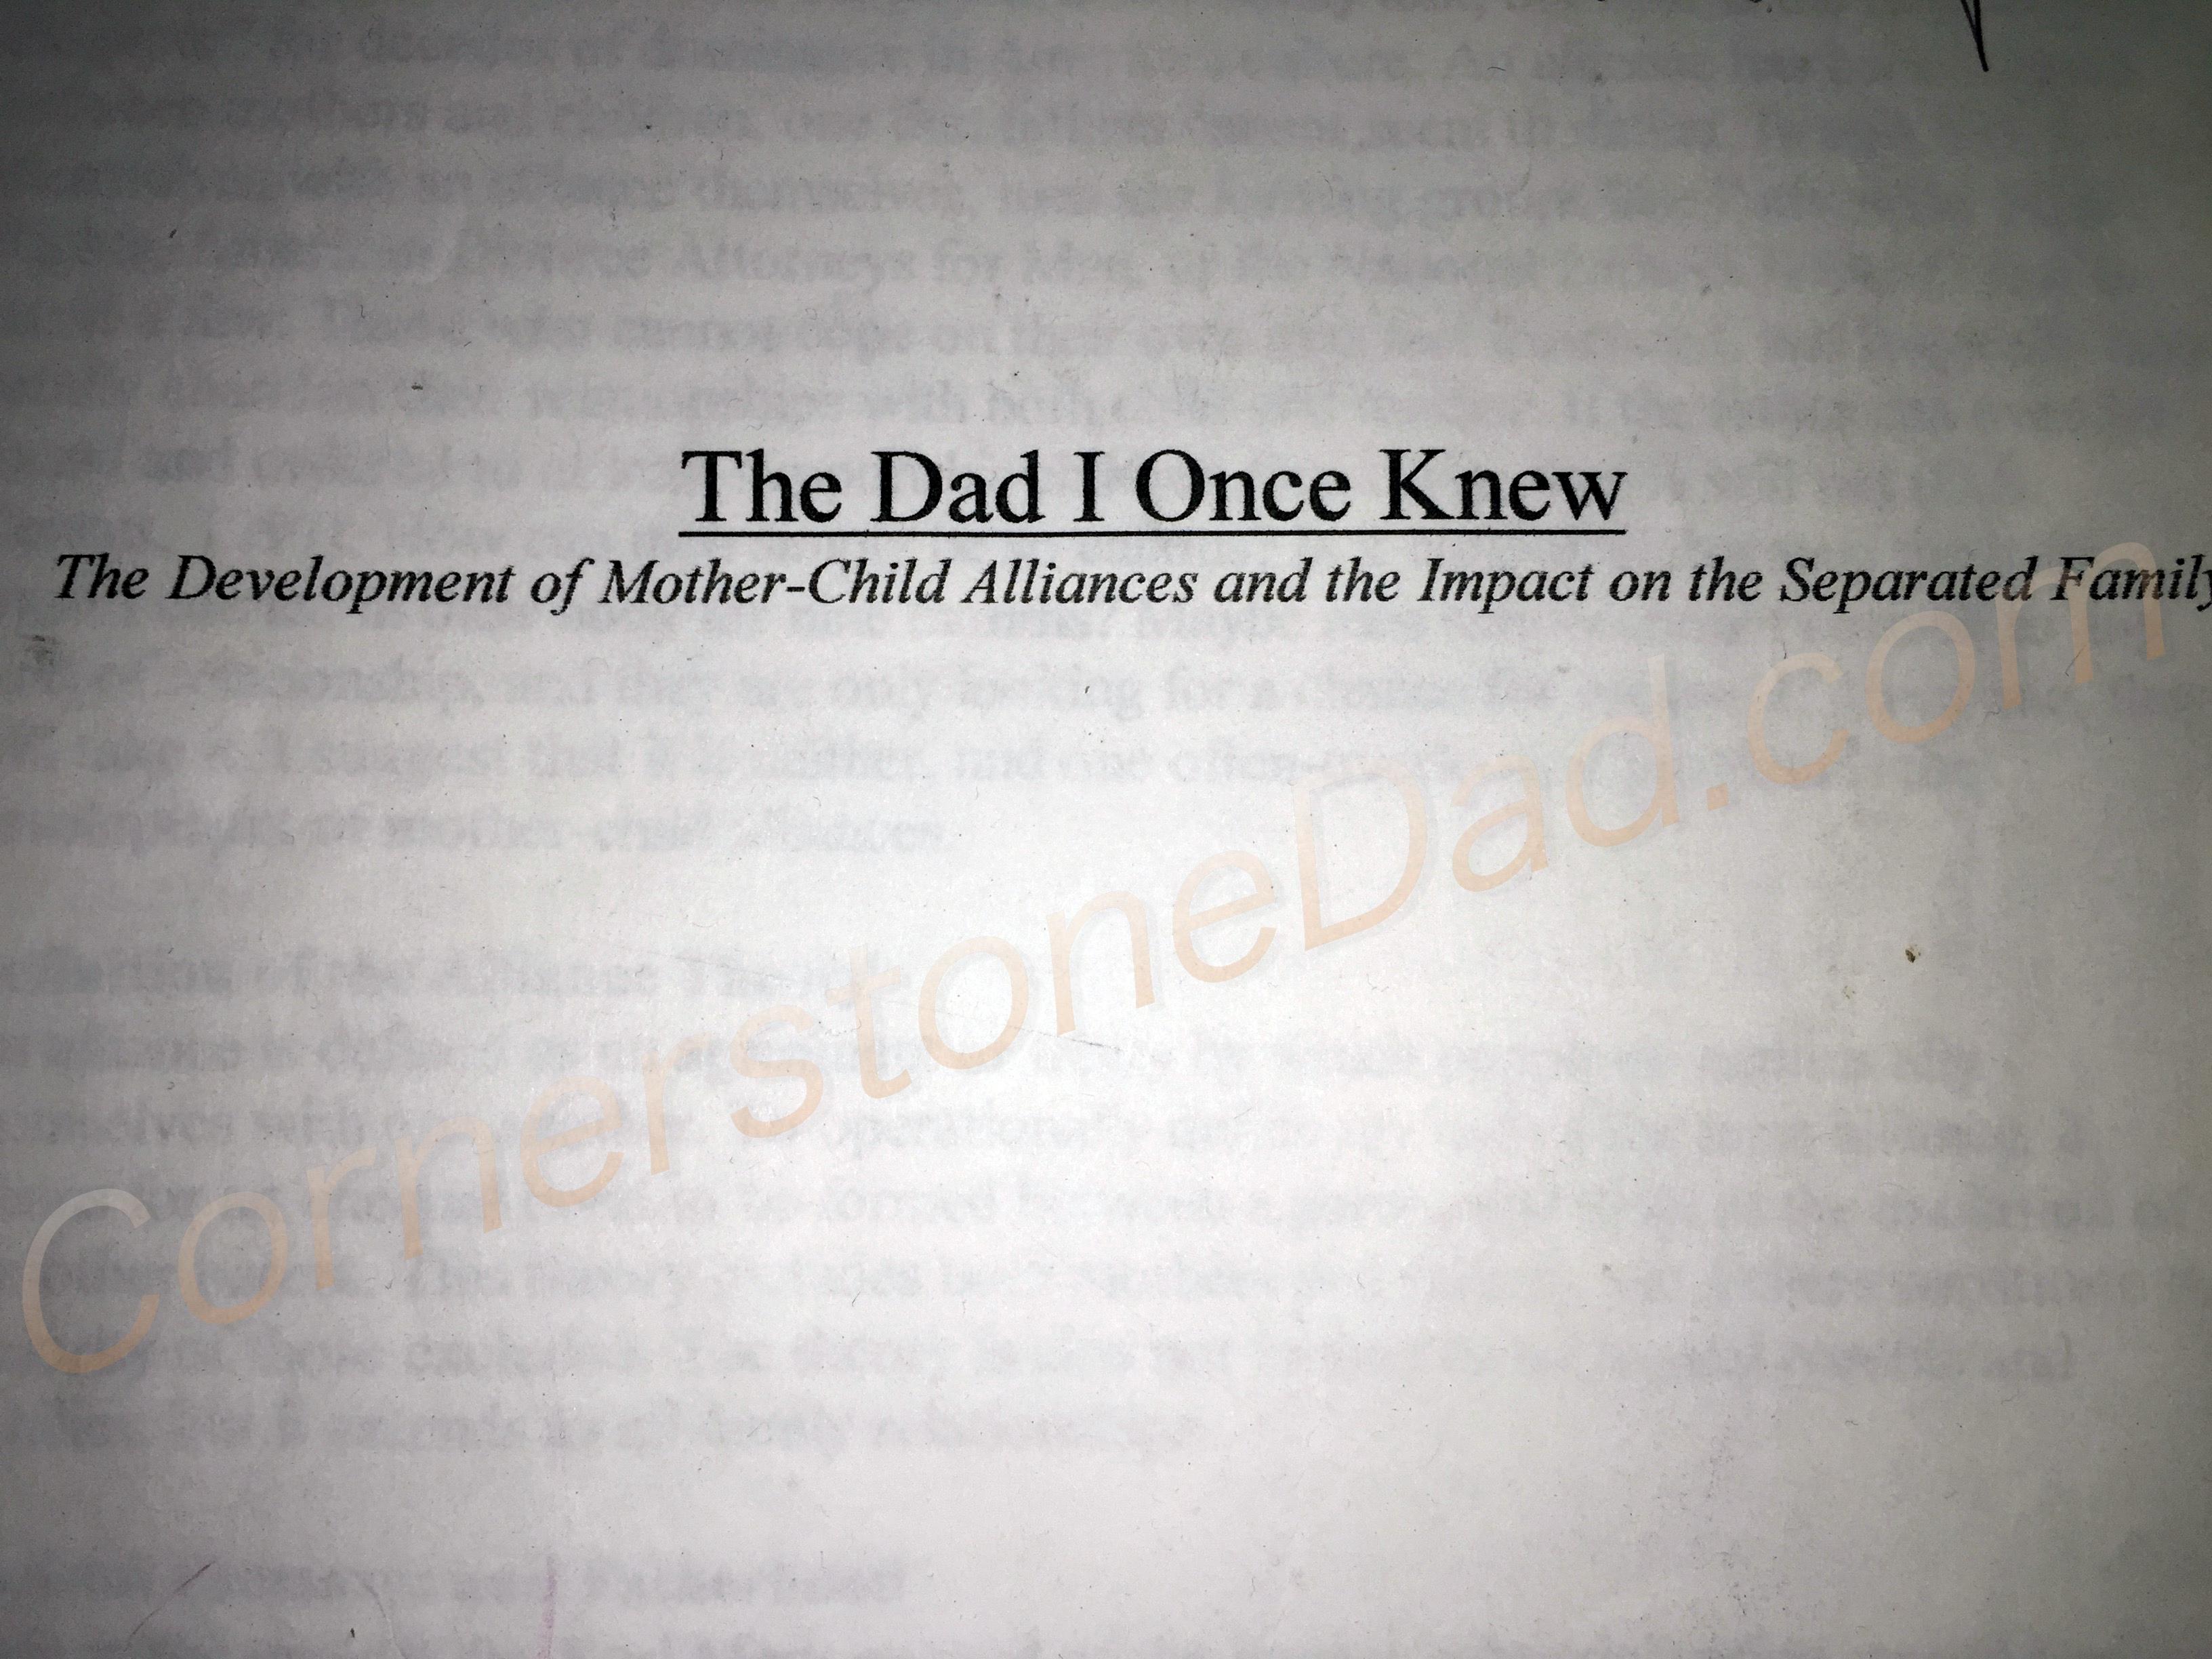 premarital sex  title page